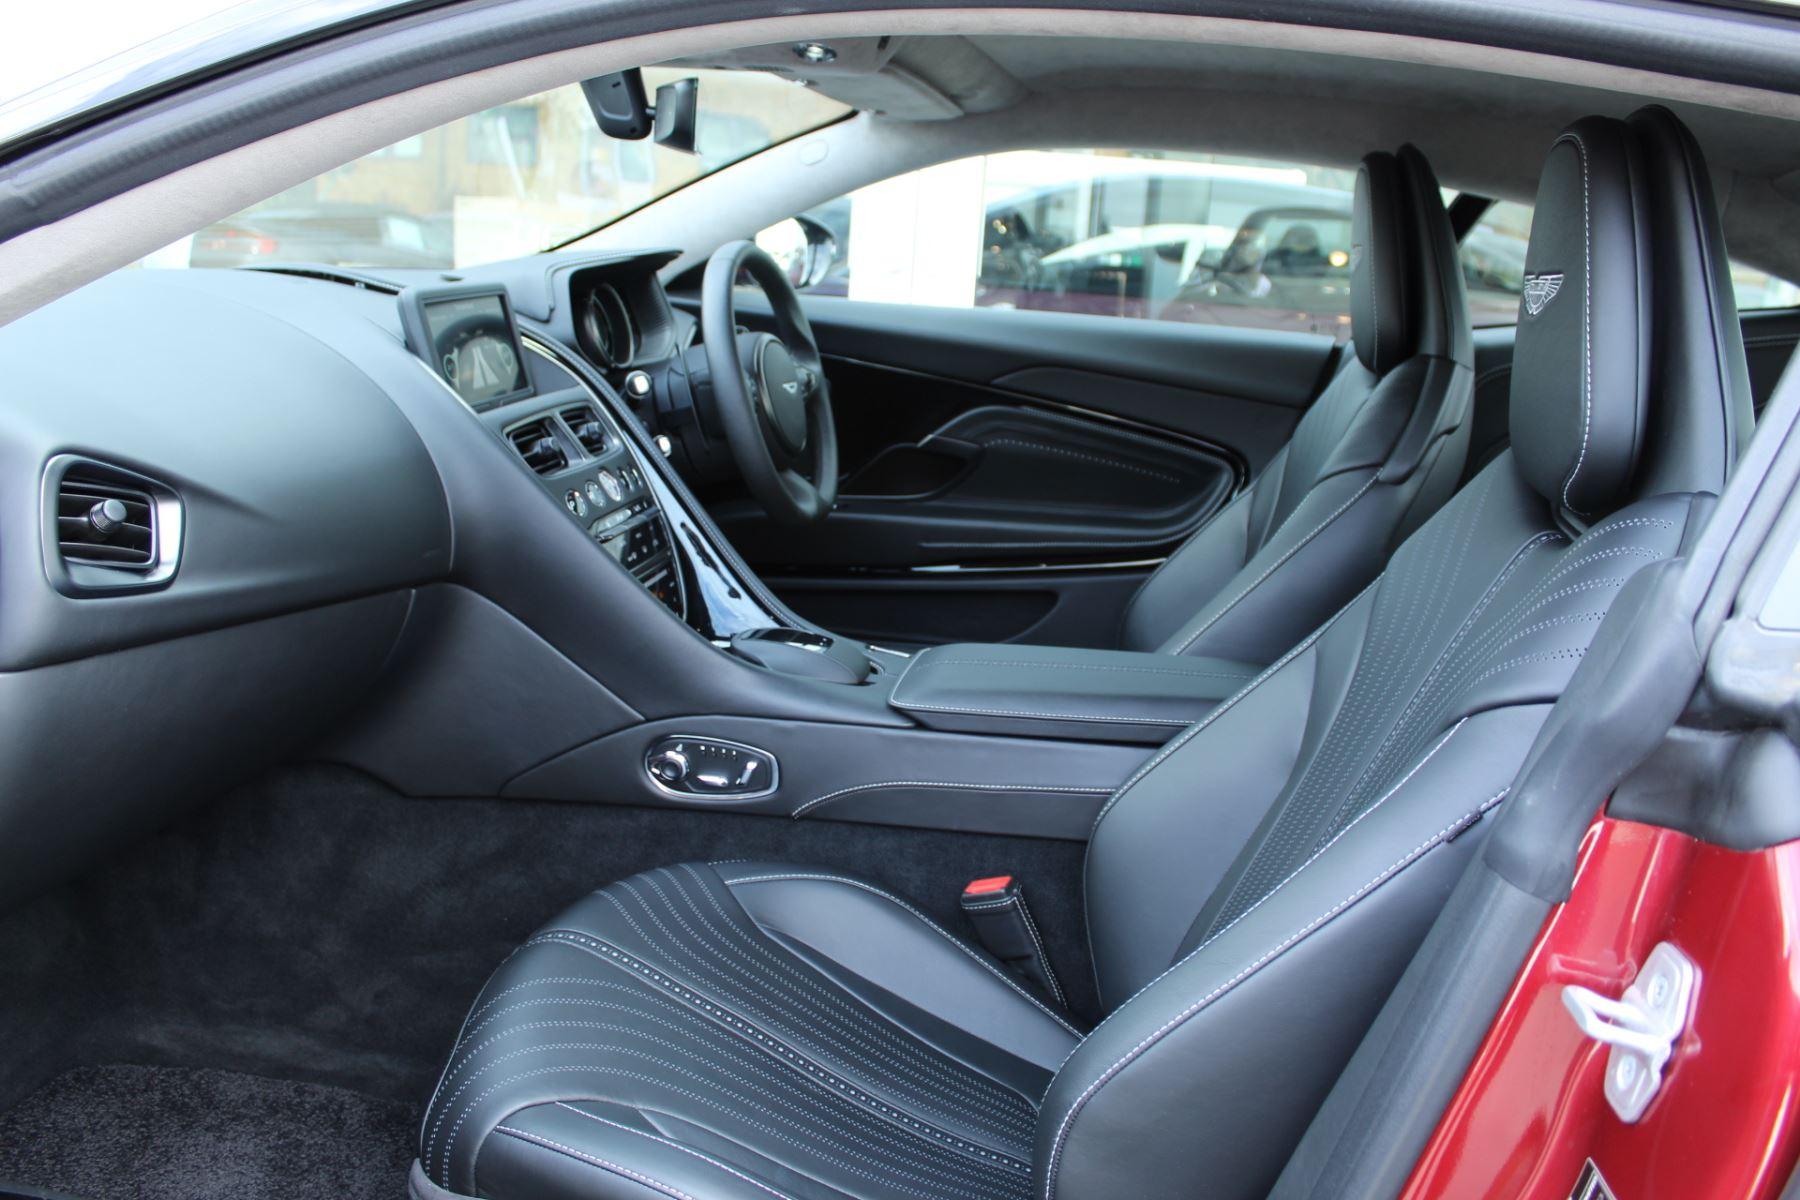 Aston Martin DB11 V8 2dr Touchtronic image 10